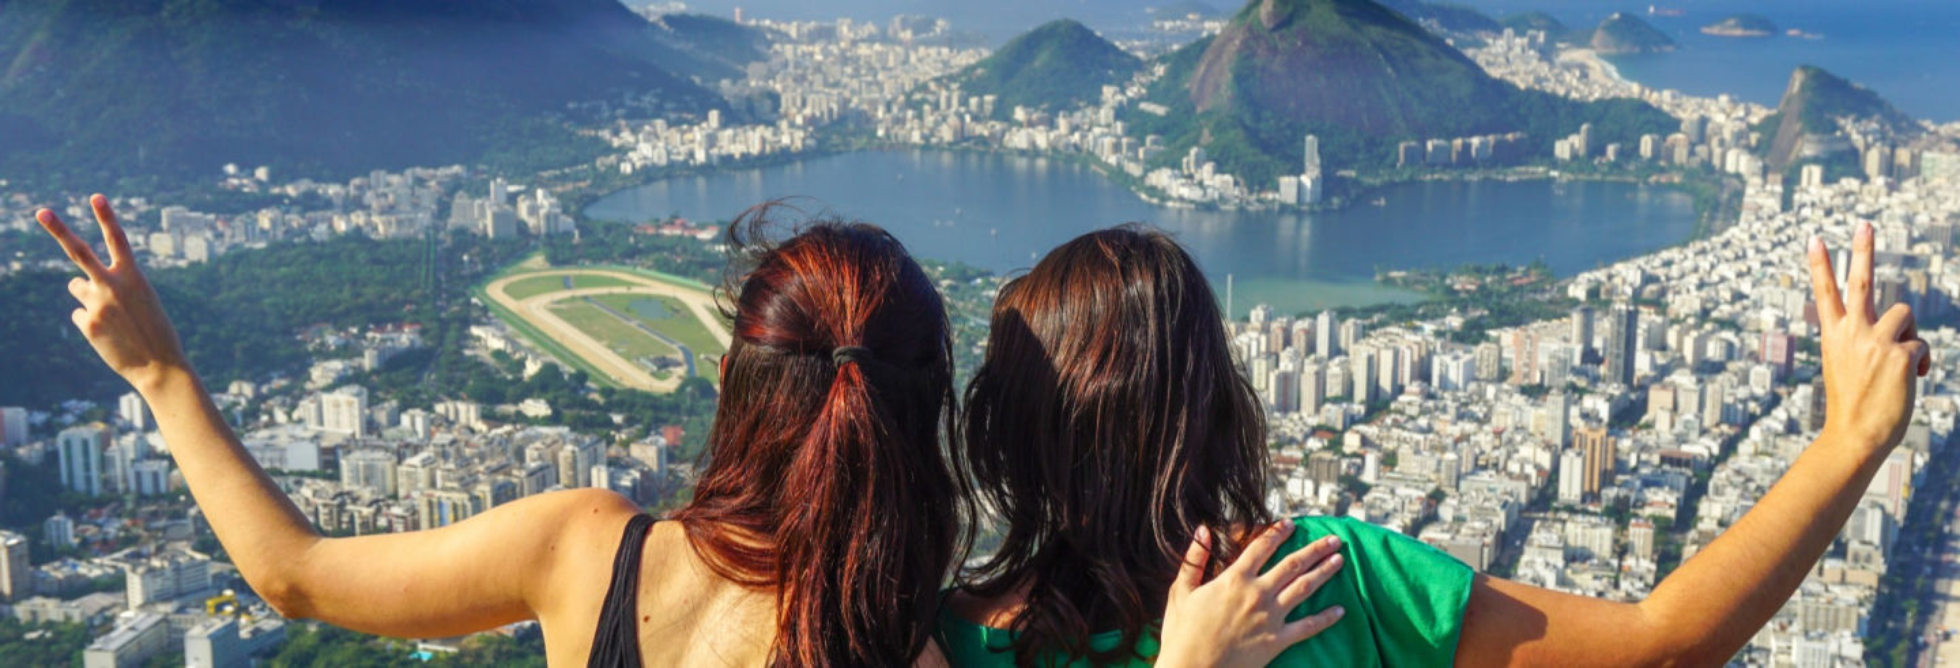 Excursión al Morro Dois Irmãos + Favela de Vidigal